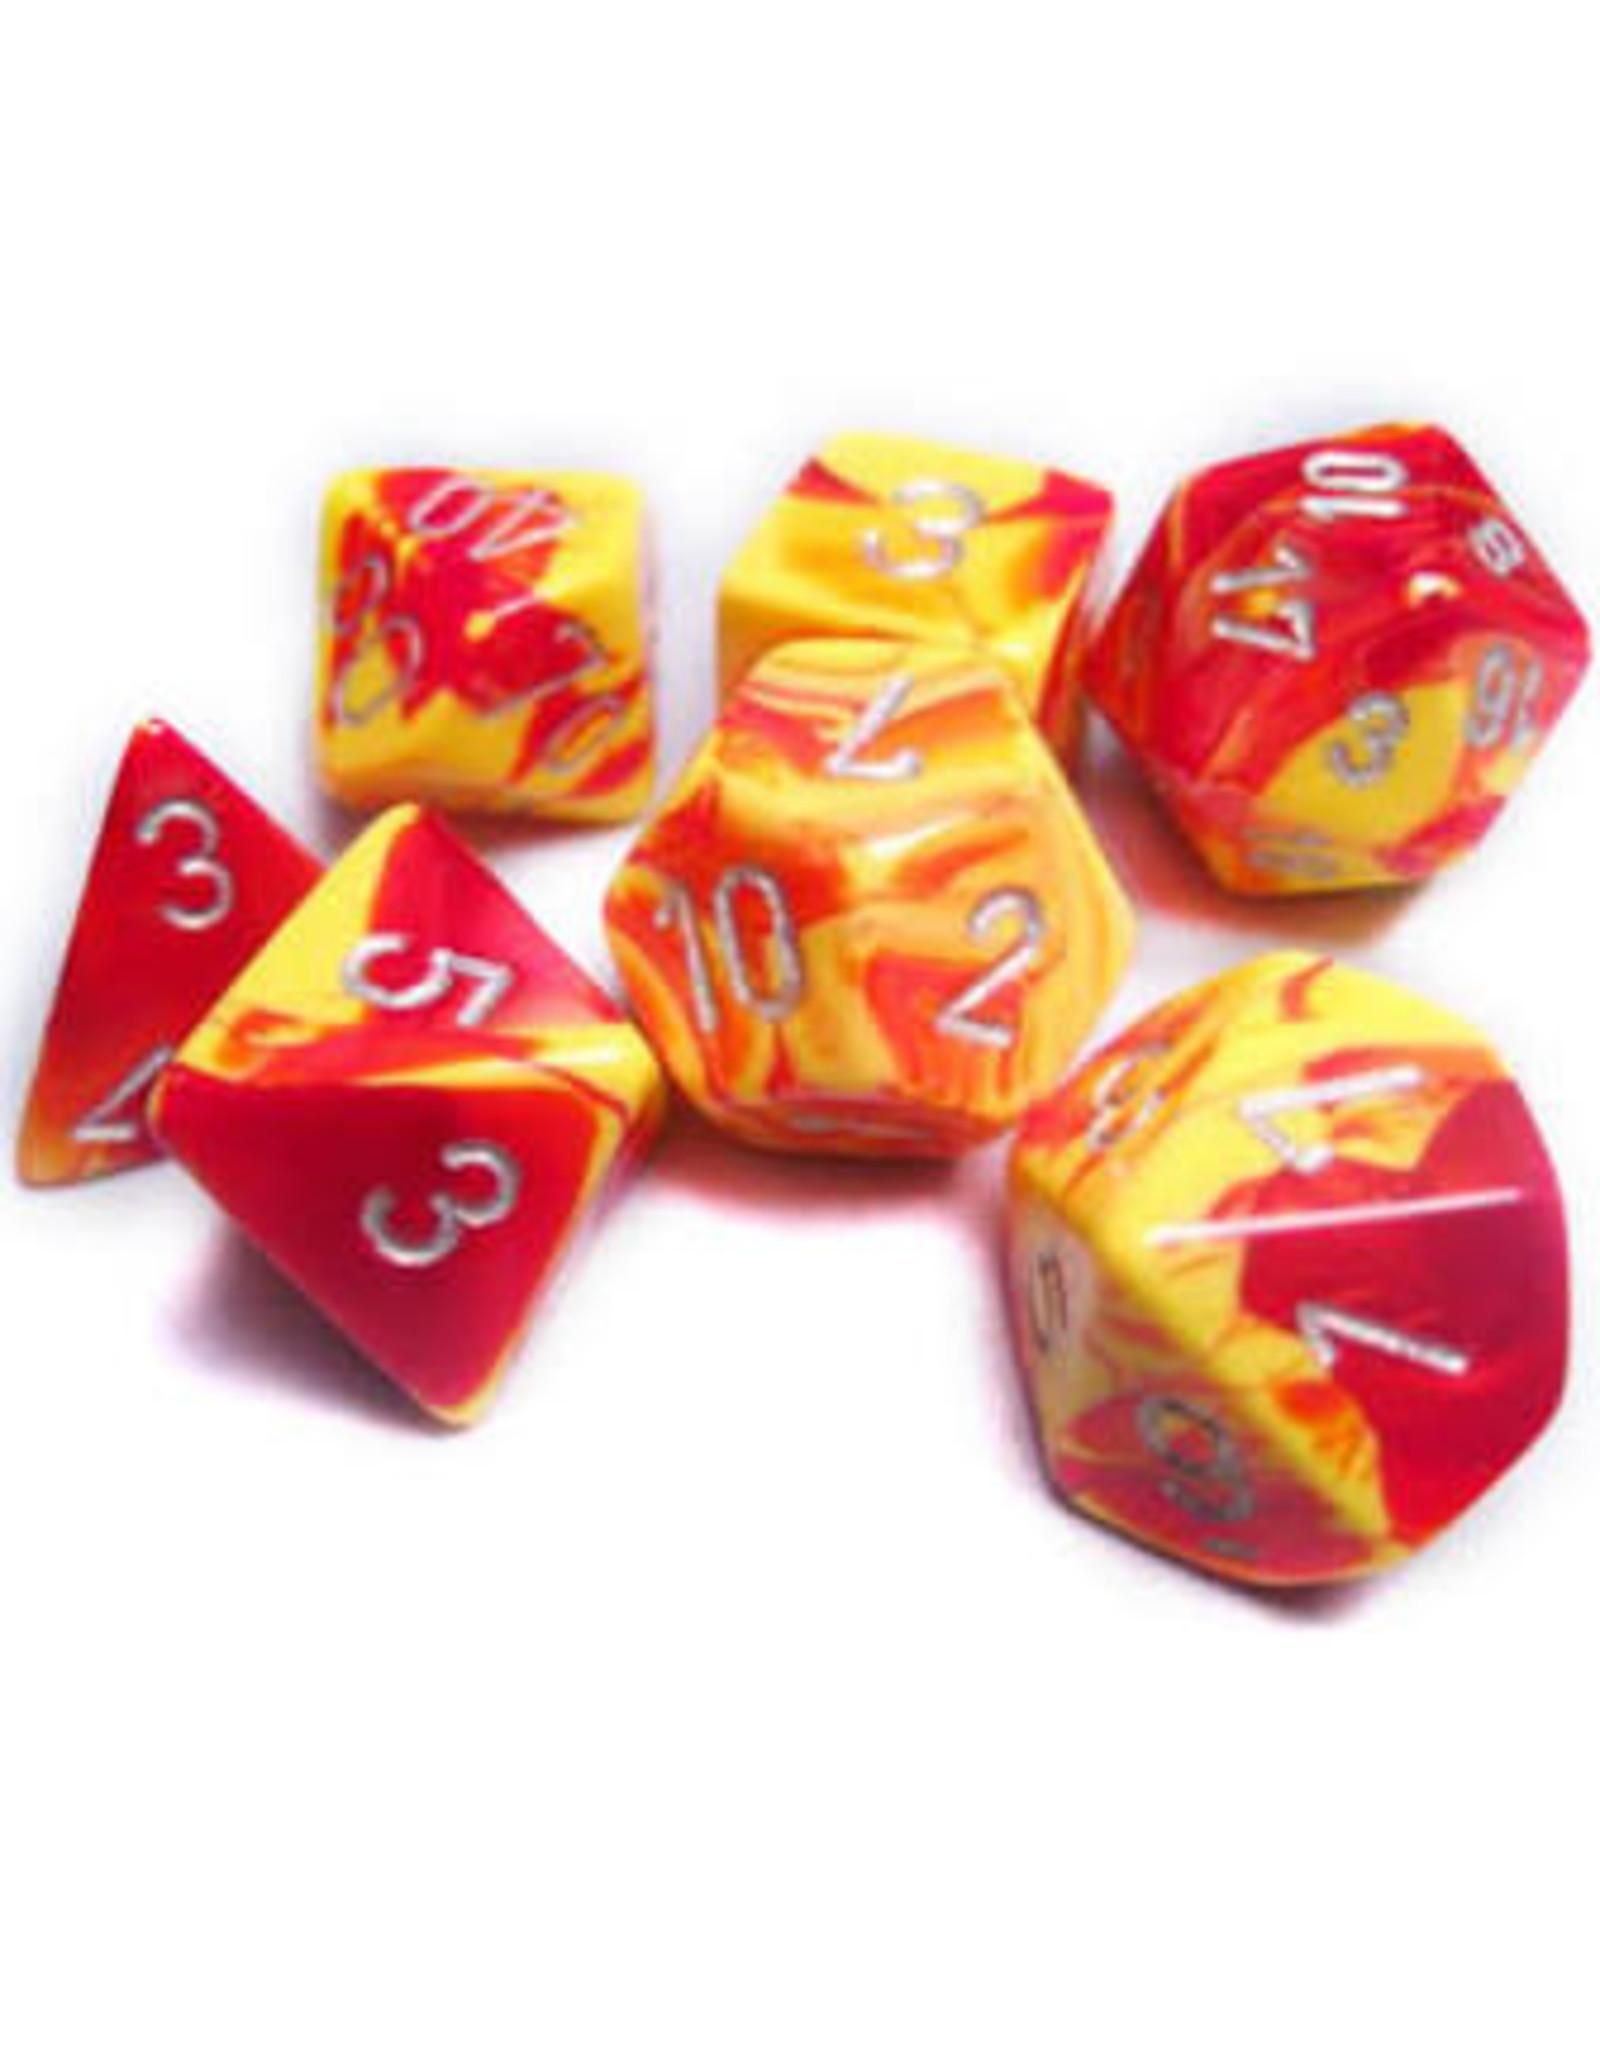 Chessex 7-Set Polyhedral Gemini 5 RED YEL w/ WHT